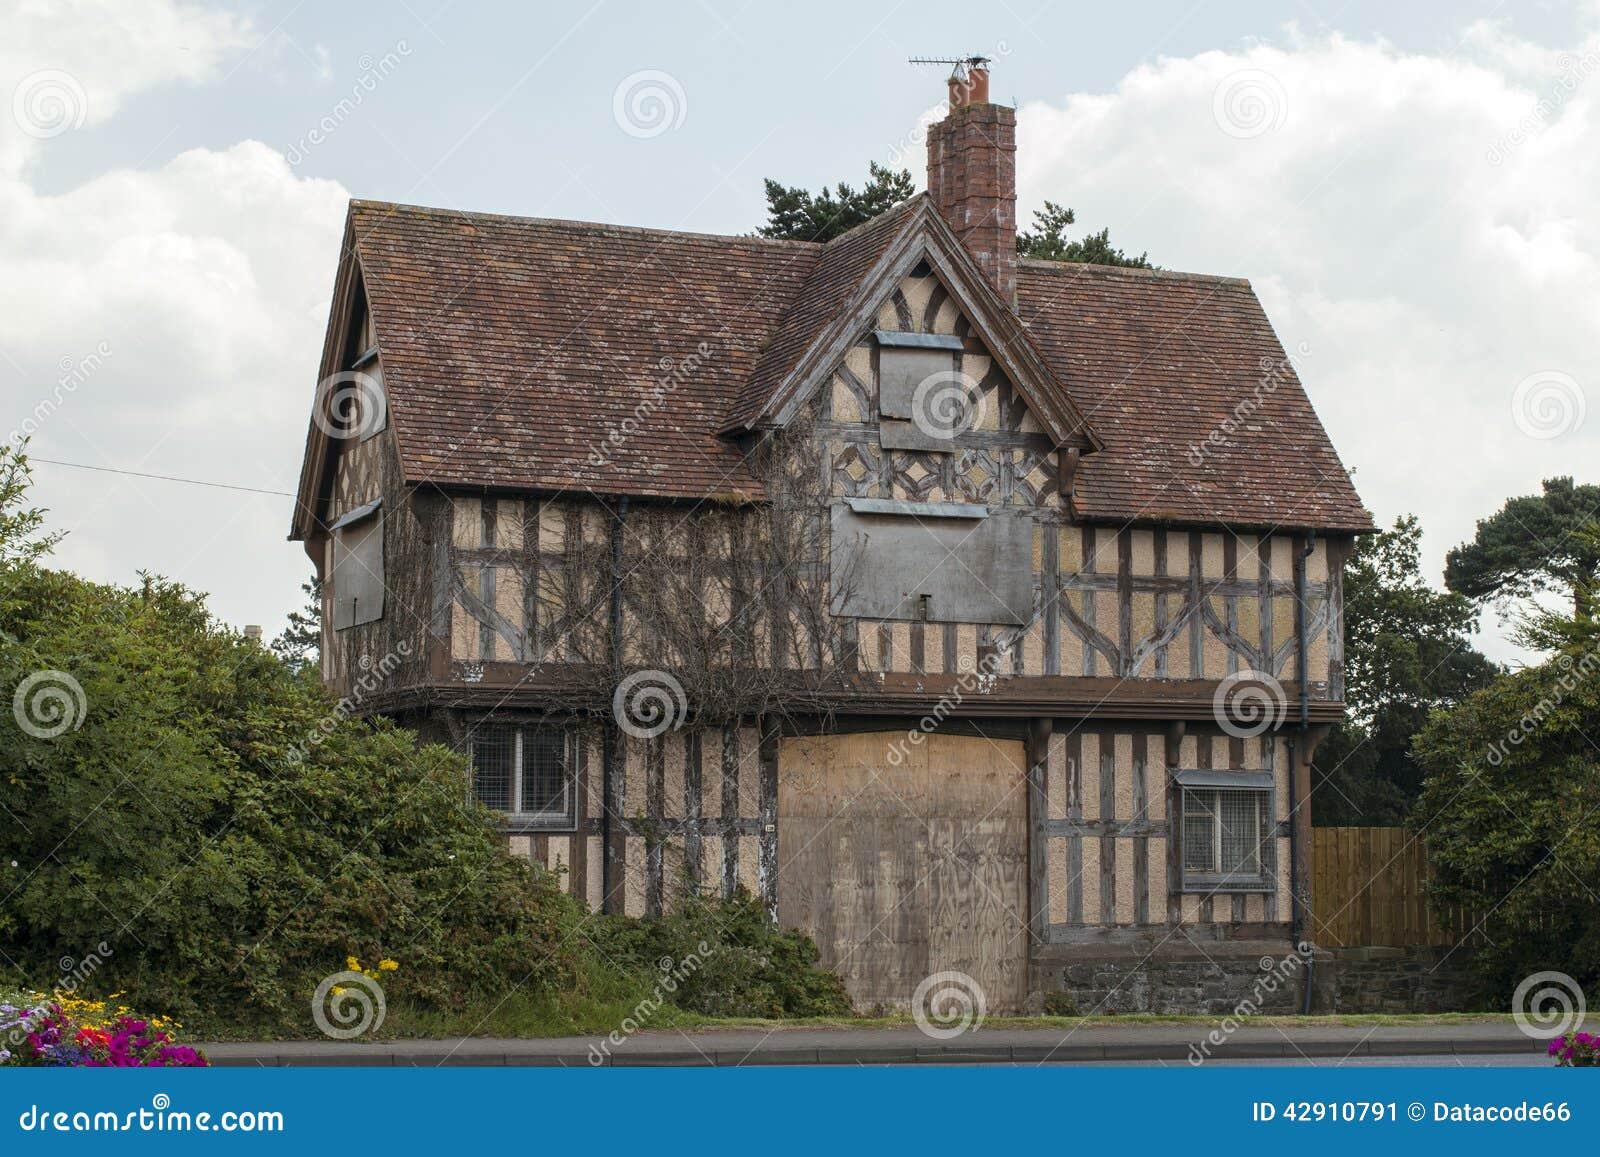 Tudor Cottage House Plans Old Tudor House Stock Image Image Of Ruined Tudor Home